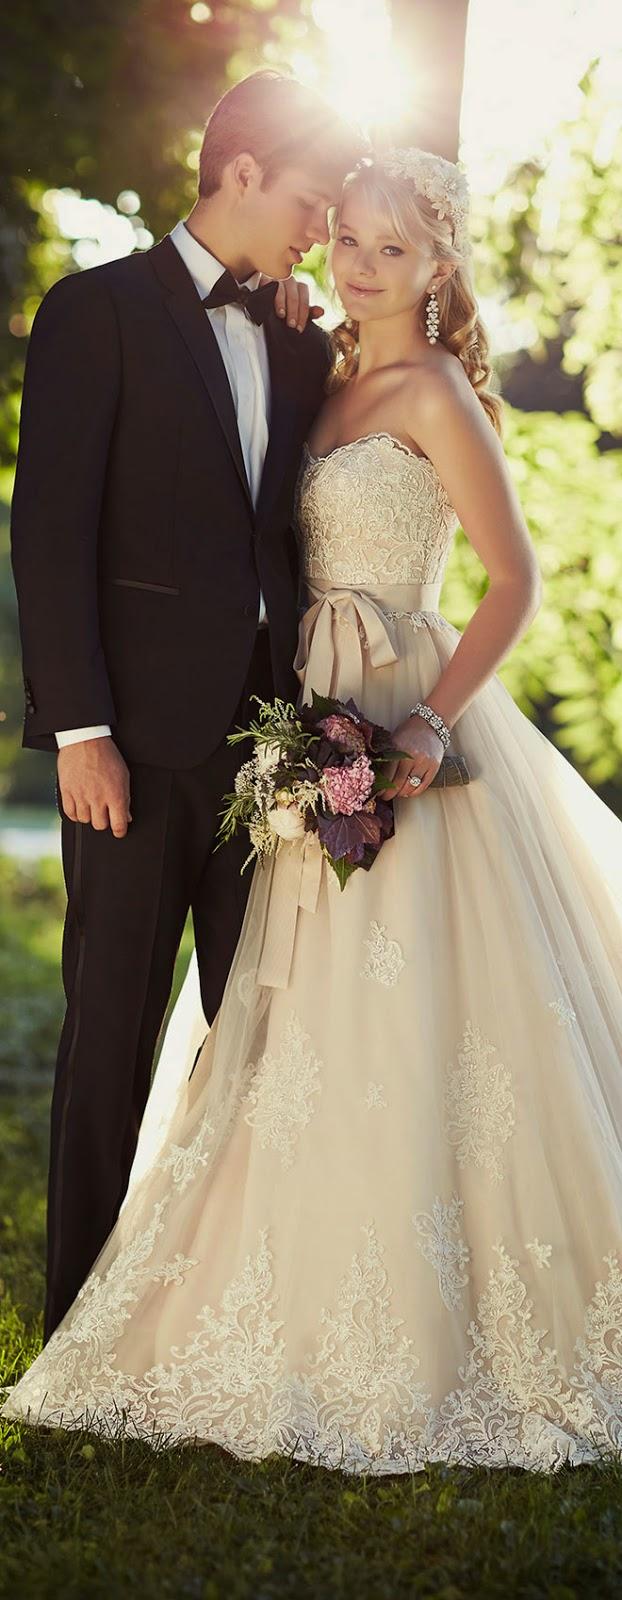 Australian Essence Wedding Dresses 74 Cute Please contact Essense of